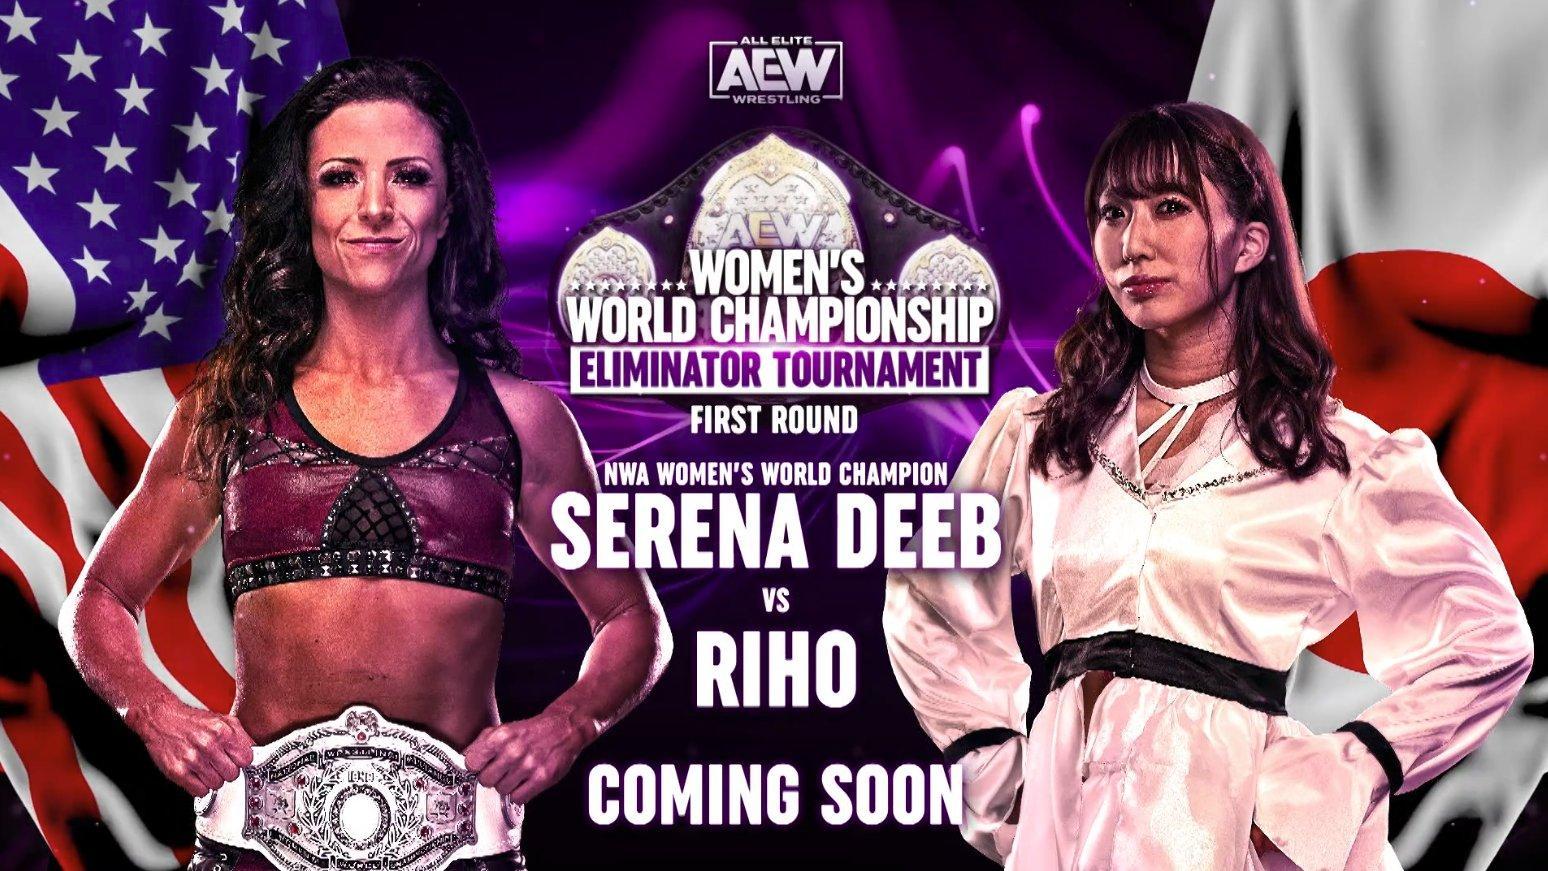 Riho Returning To AEW, Will Face Serena Deeb In Women's Eliminator Tournament